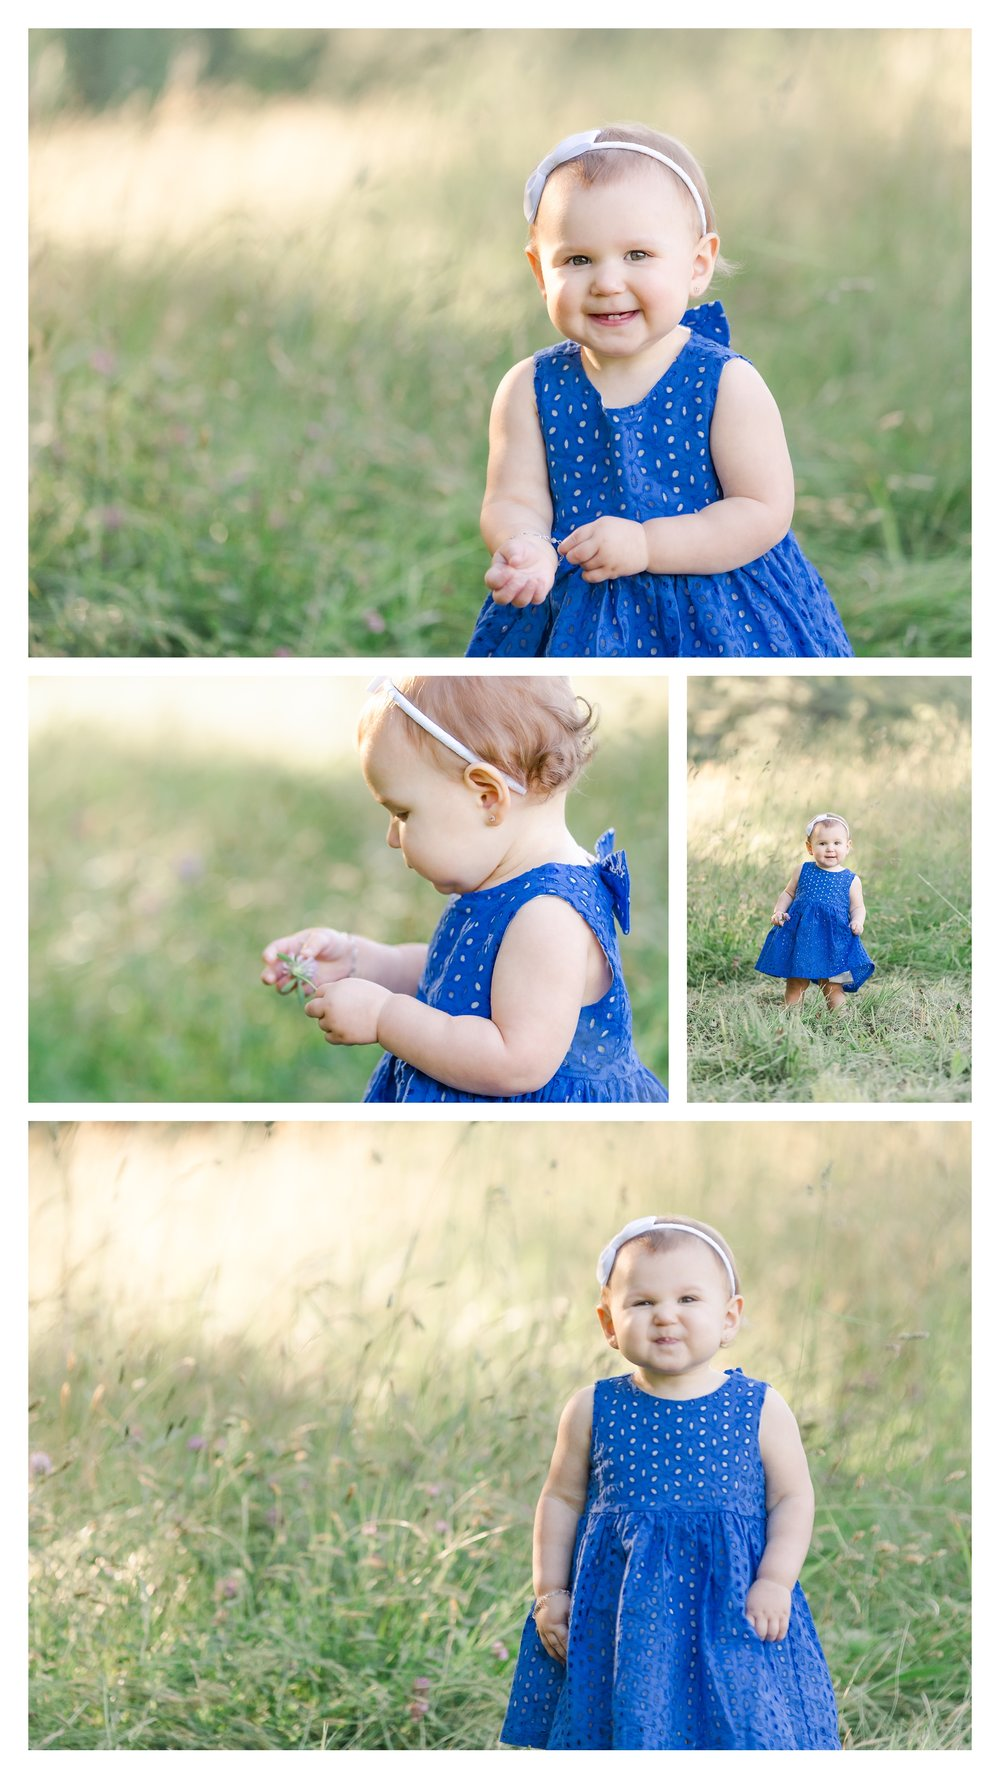 childrensportraits-fairfieldcountyct-kristinwoodphotography.jpg